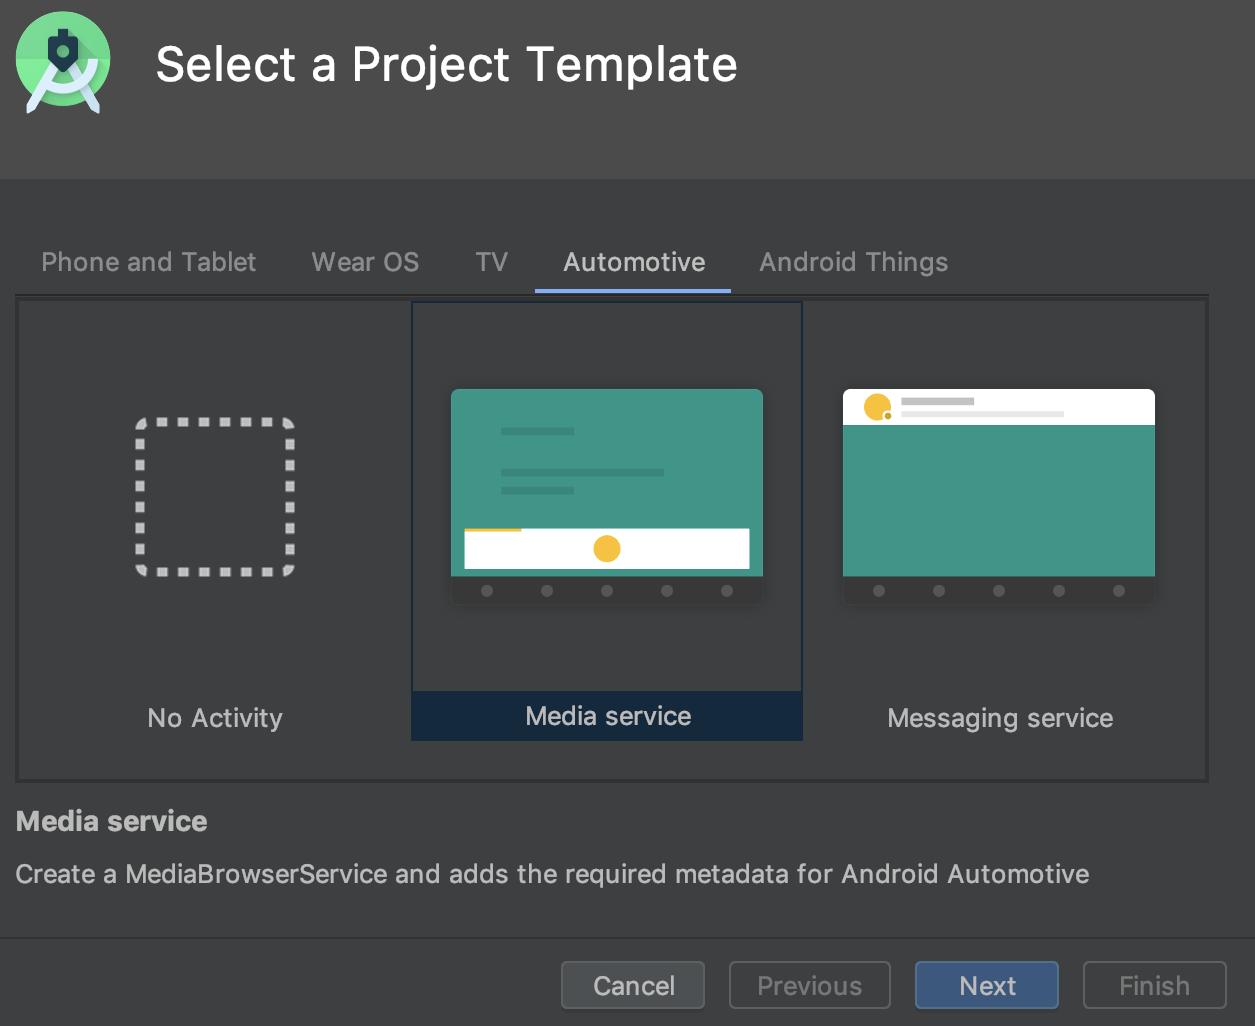 Android Automotive プロジェクトのテンプレートを選択